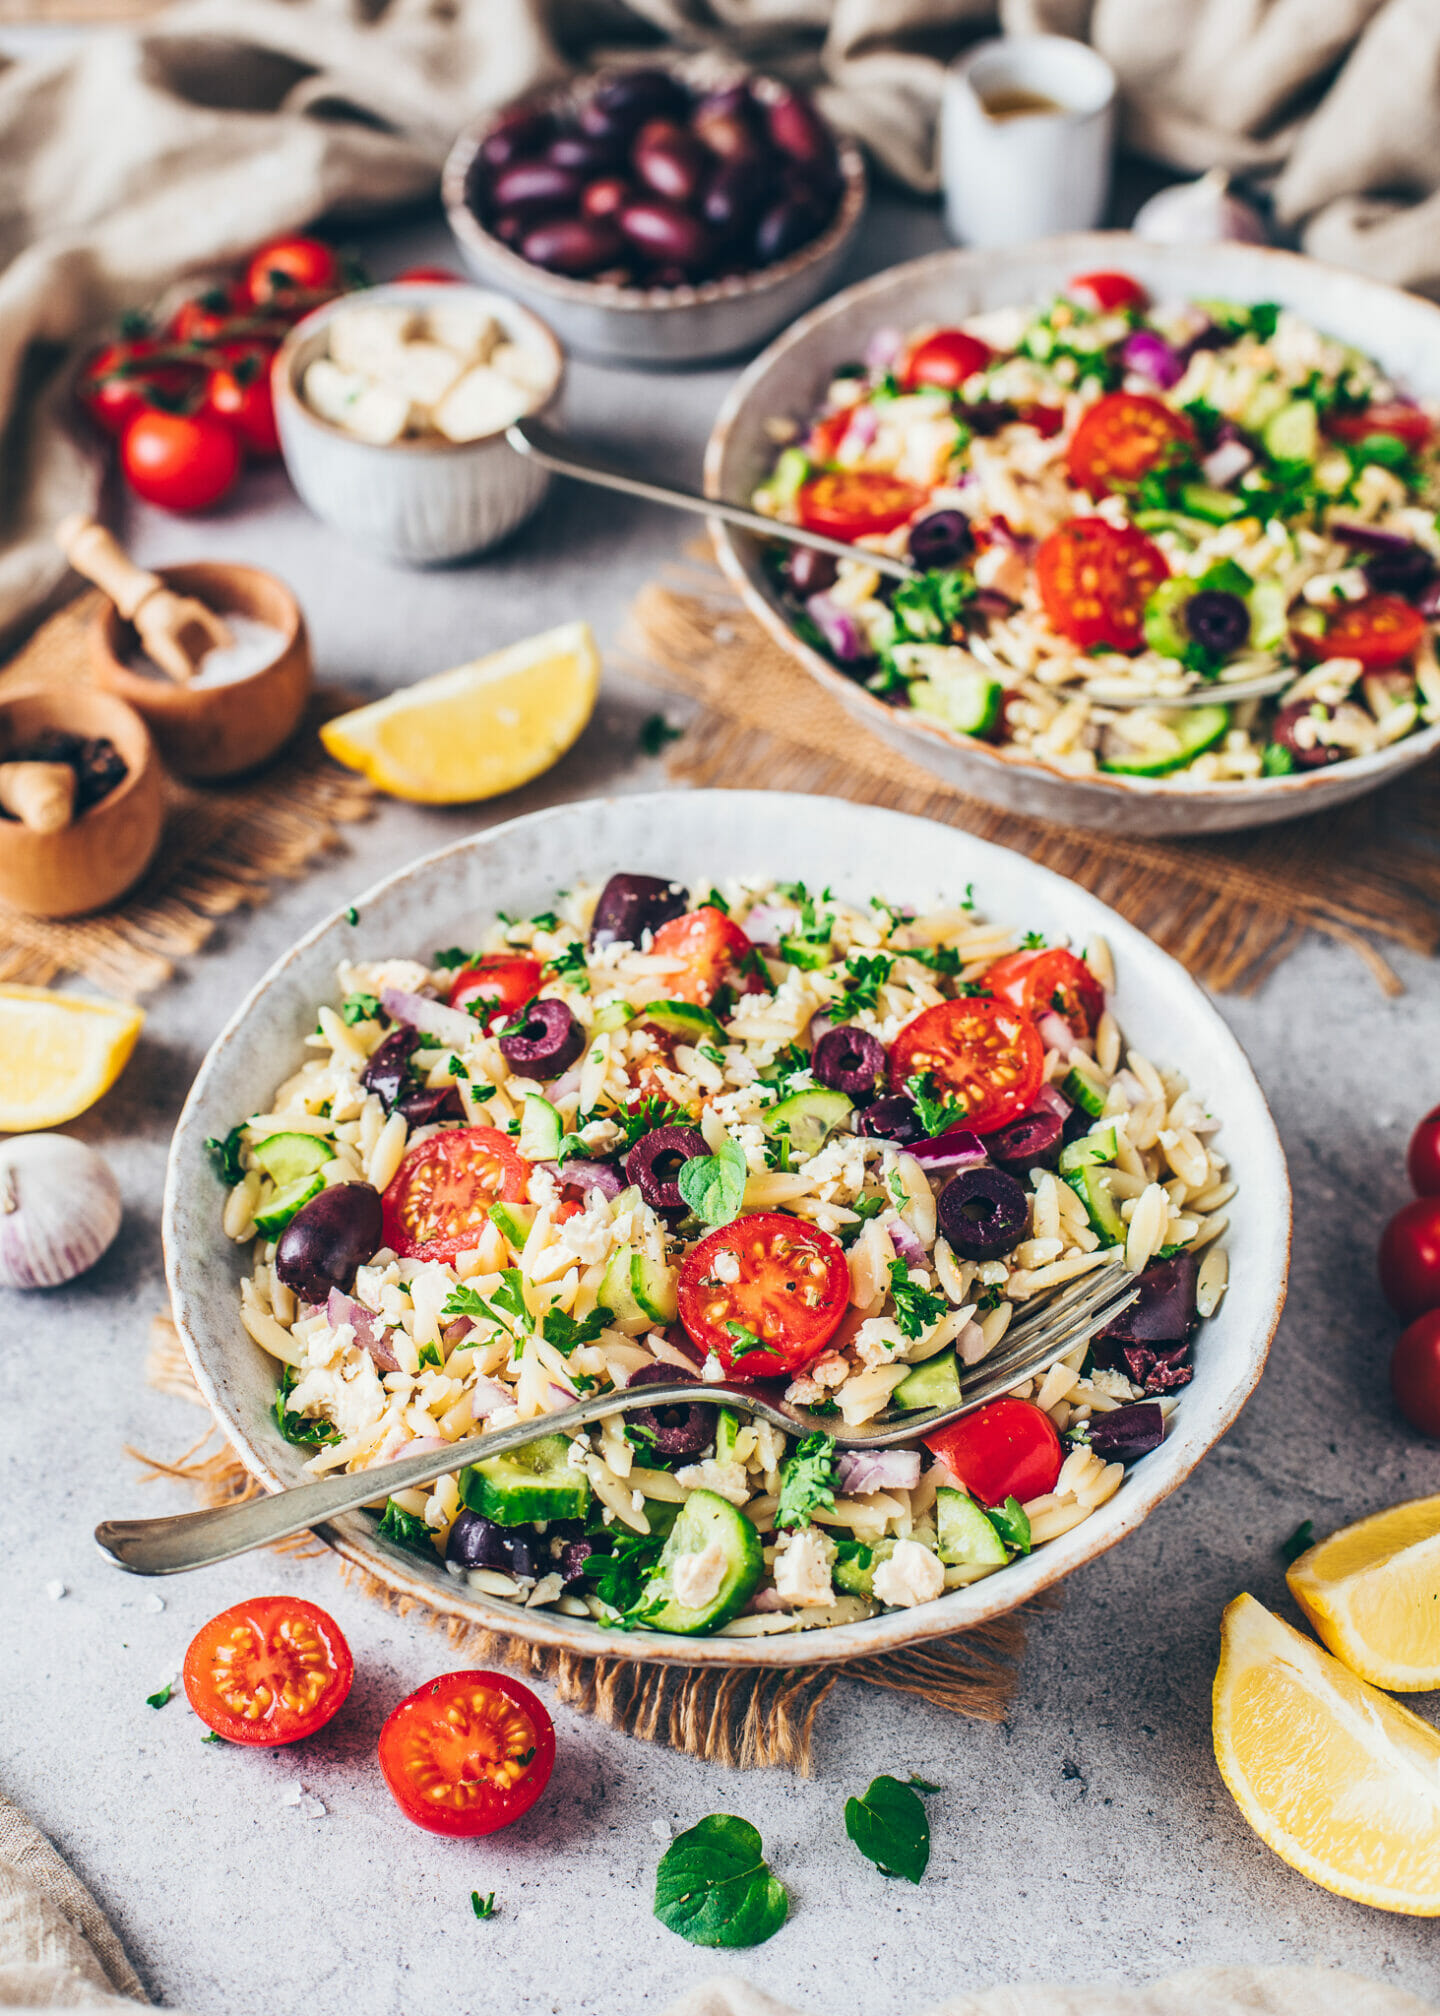 Greek Orzo Salad with Veggies and Vegan Feta